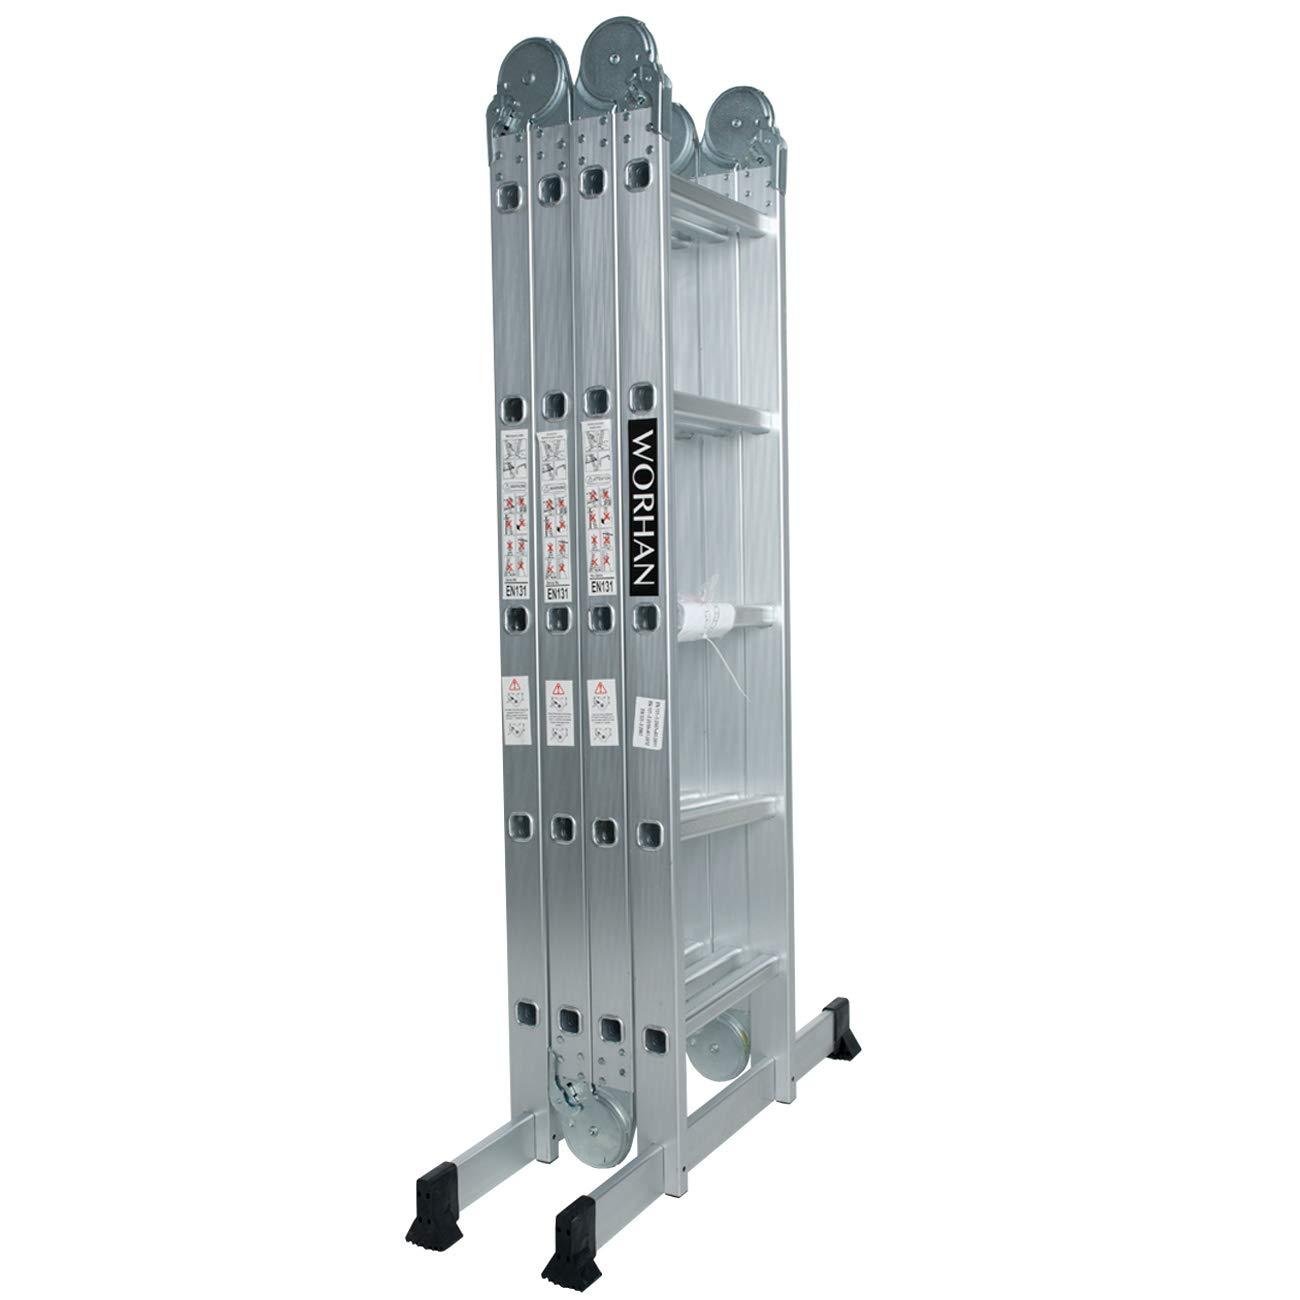 WORHAN® 5.7m Foldable Multipurpose Multifunction Aluminium BIG HINGE Ladder with Twin Stabilizers Step Ladder KS5.7 WORHAN®